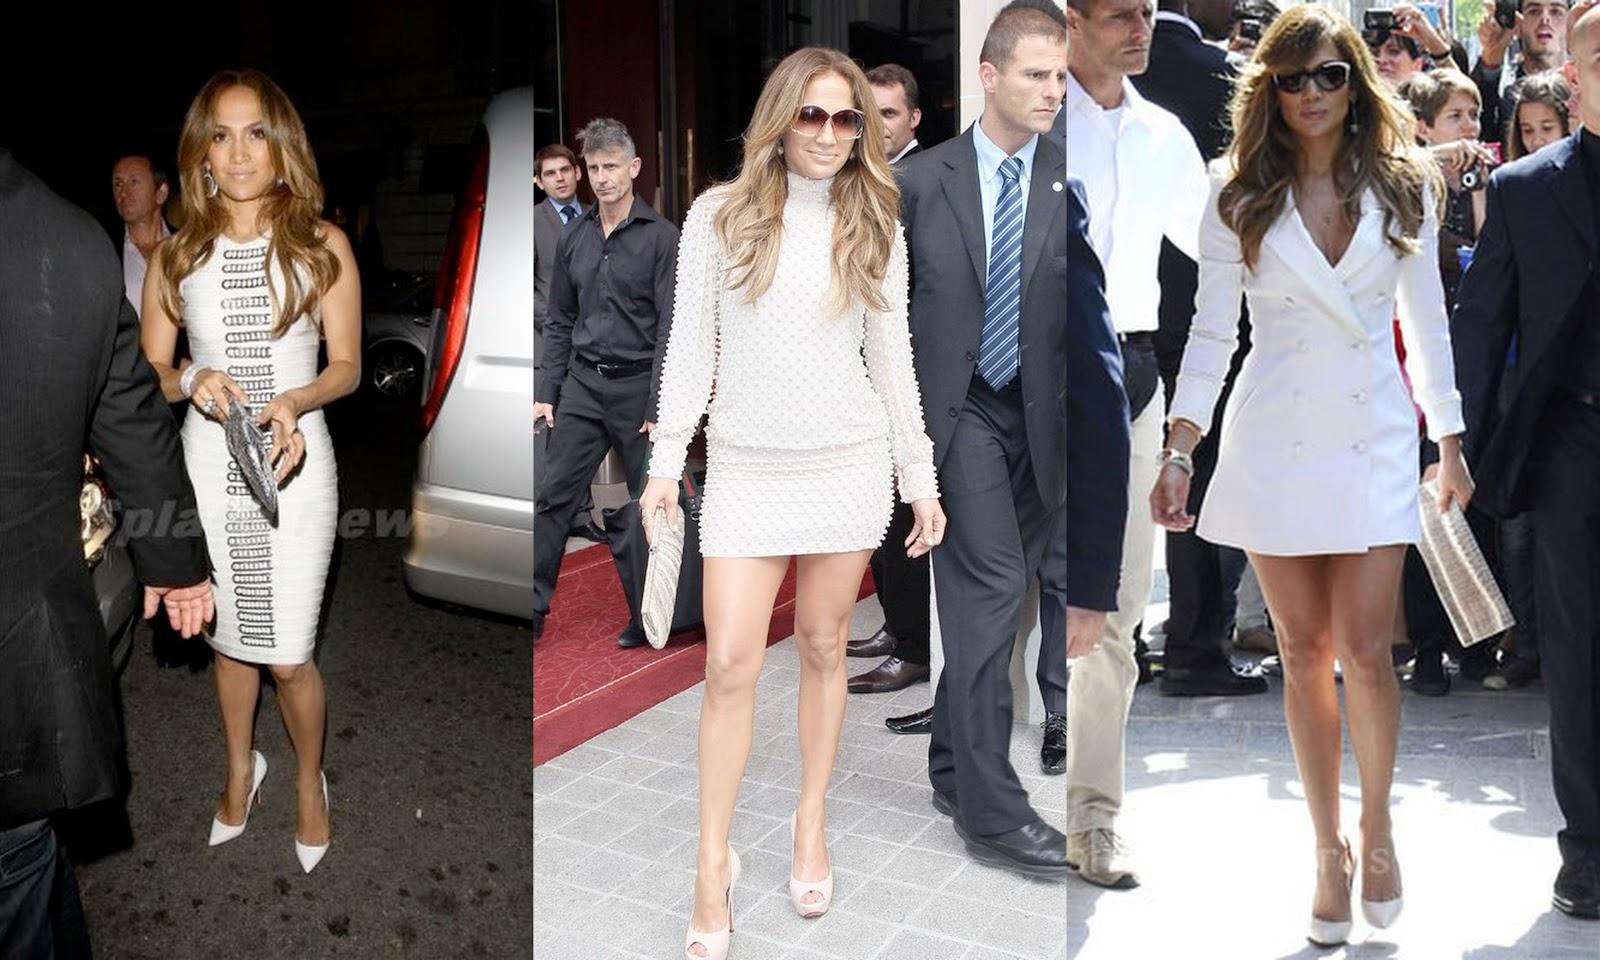 http://2.bp.blogspot.com/-iHJUm-hAMnA/TfoZmXgfGNI/AAAAAAAAFJQ/sRONAzMdYXY/s1600/Jennifer+Lopez.jpg